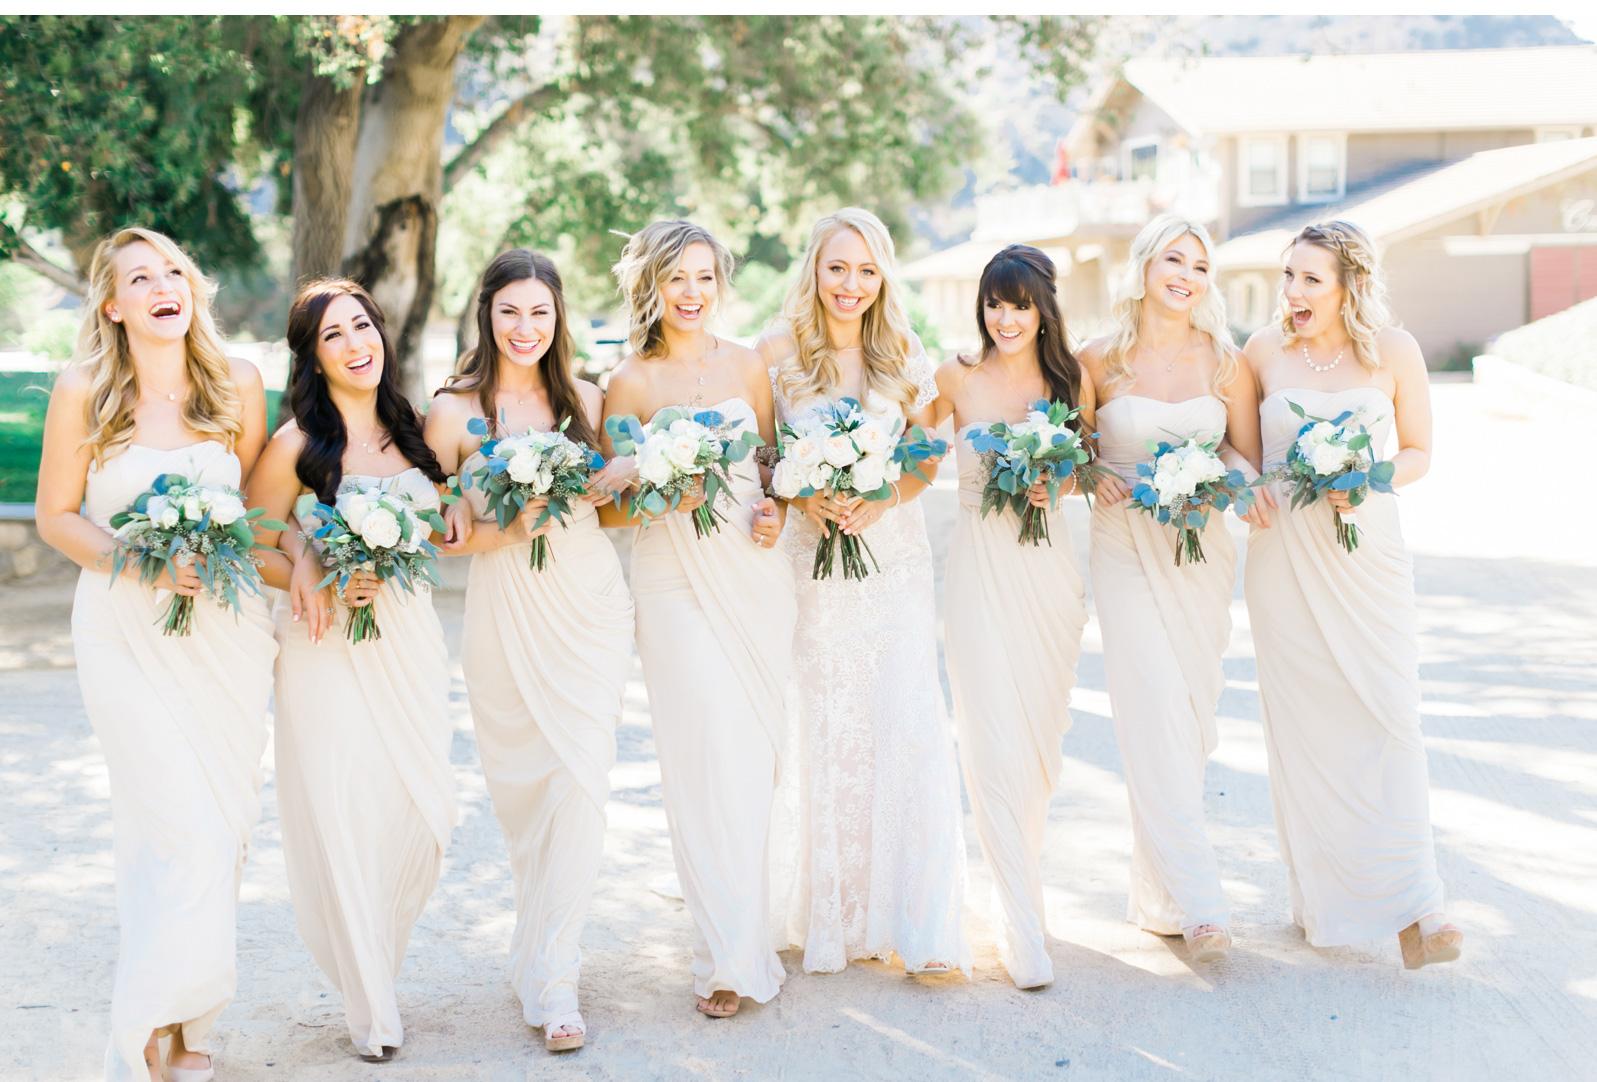 Temecula-Wedding-Photographer-Style-Me-Pretty-Natalie-Schutt-Photography_14.jpg